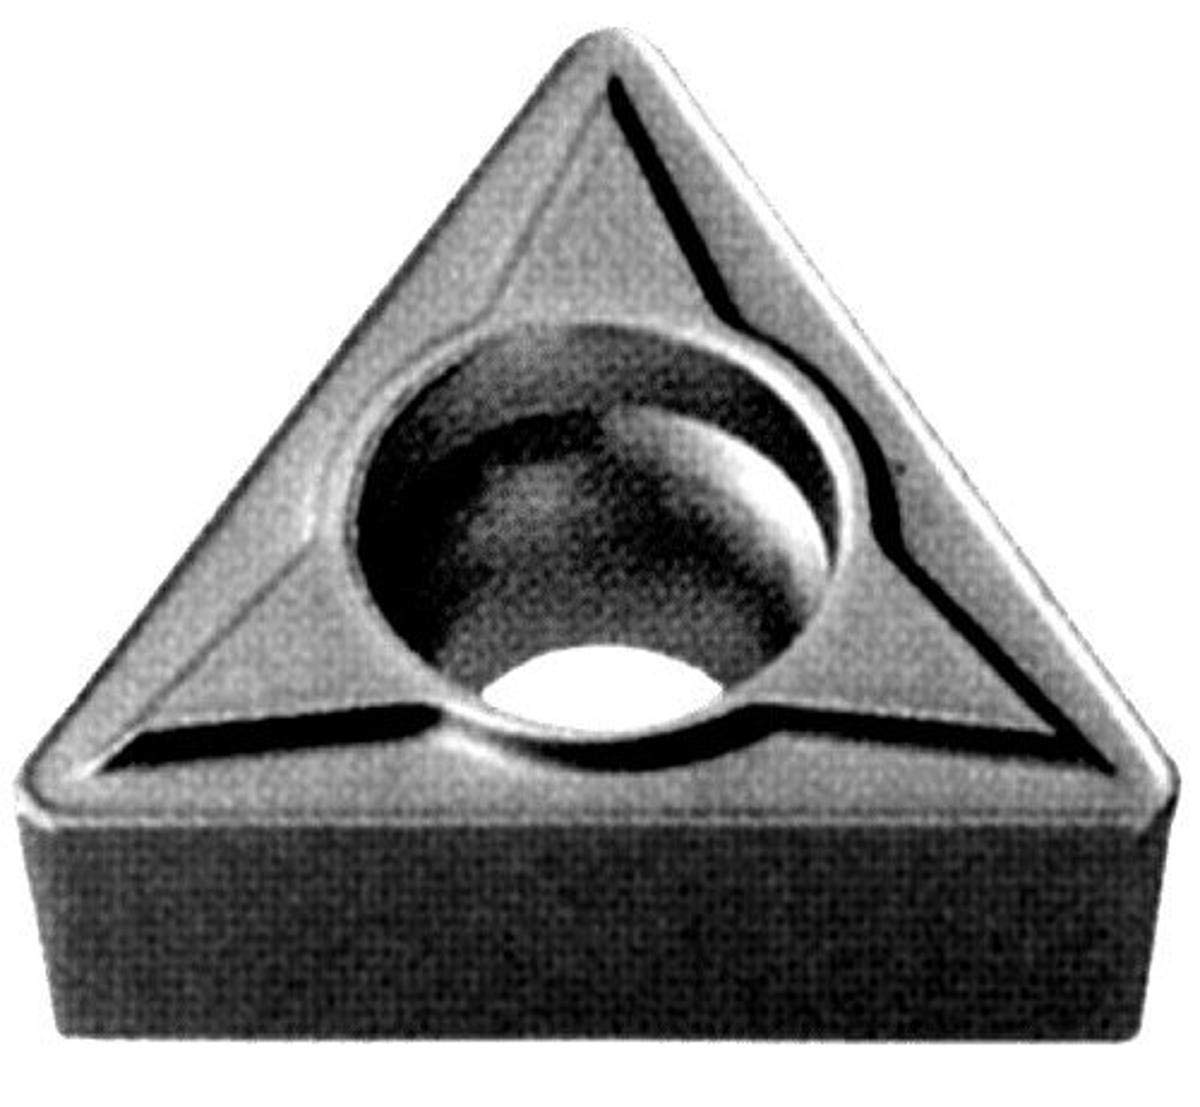 Cobra Carbide 40956 Solid Carbide Turning Insert, C550 Grade, Un